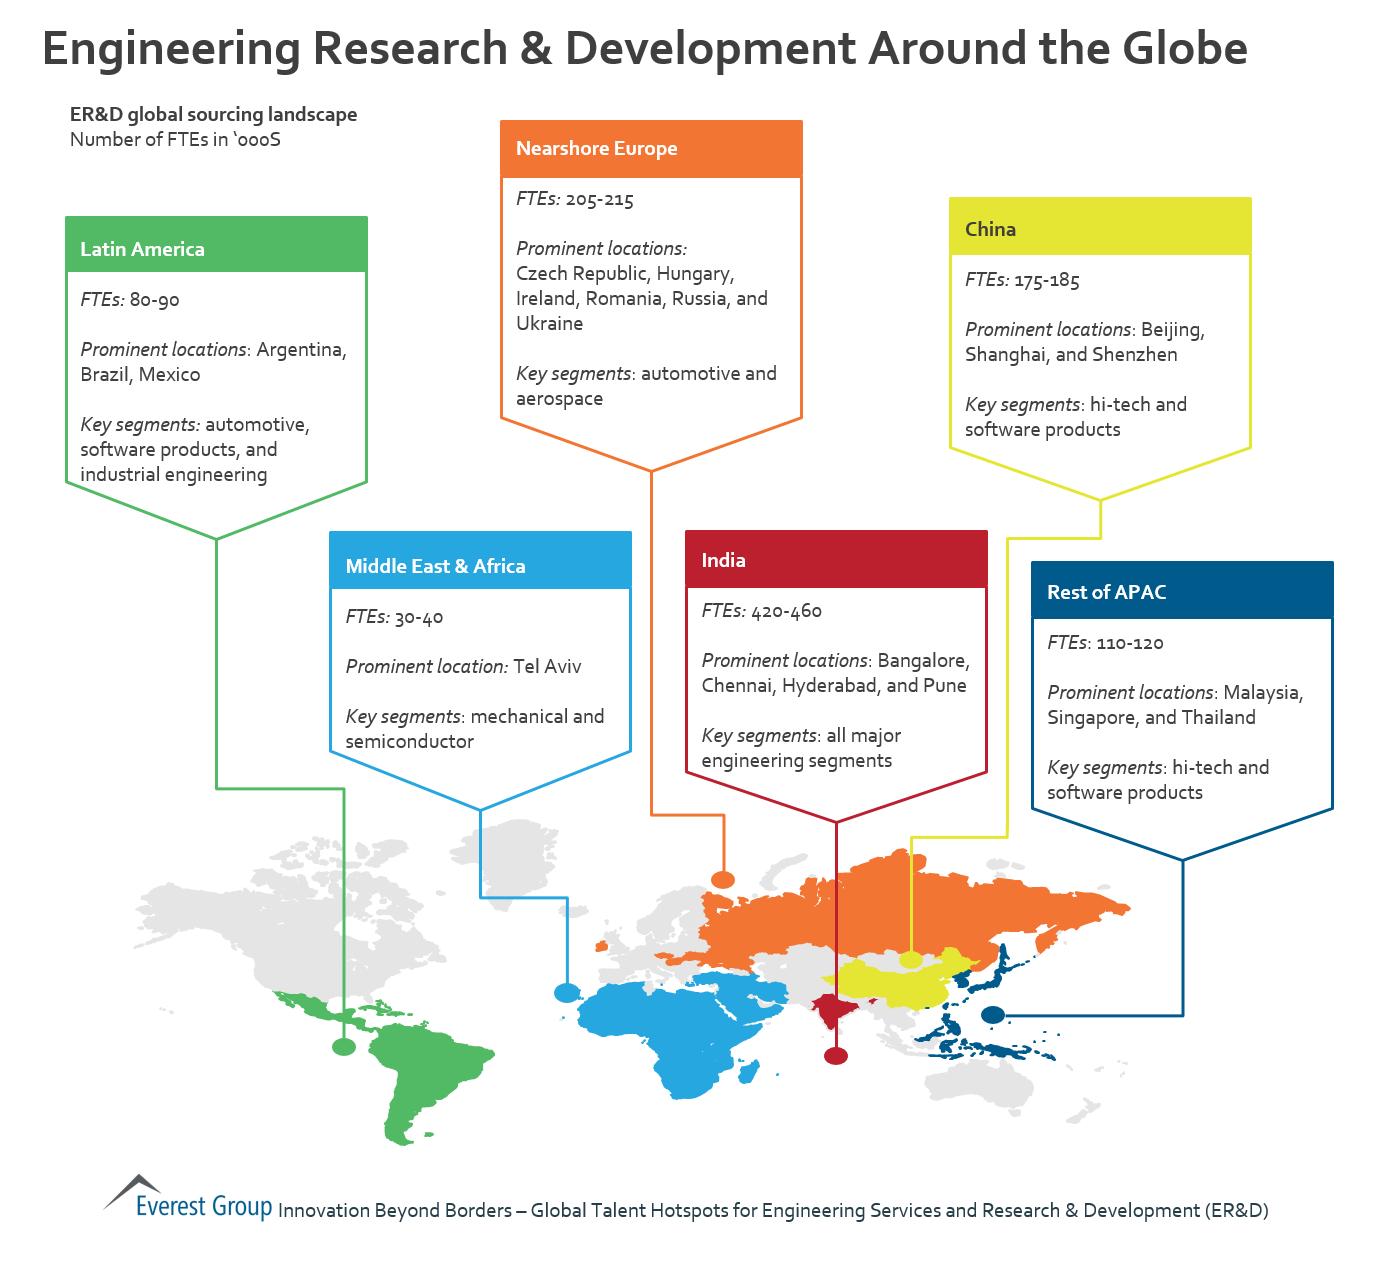 Market World: Engineering Research & Development Around The Globe